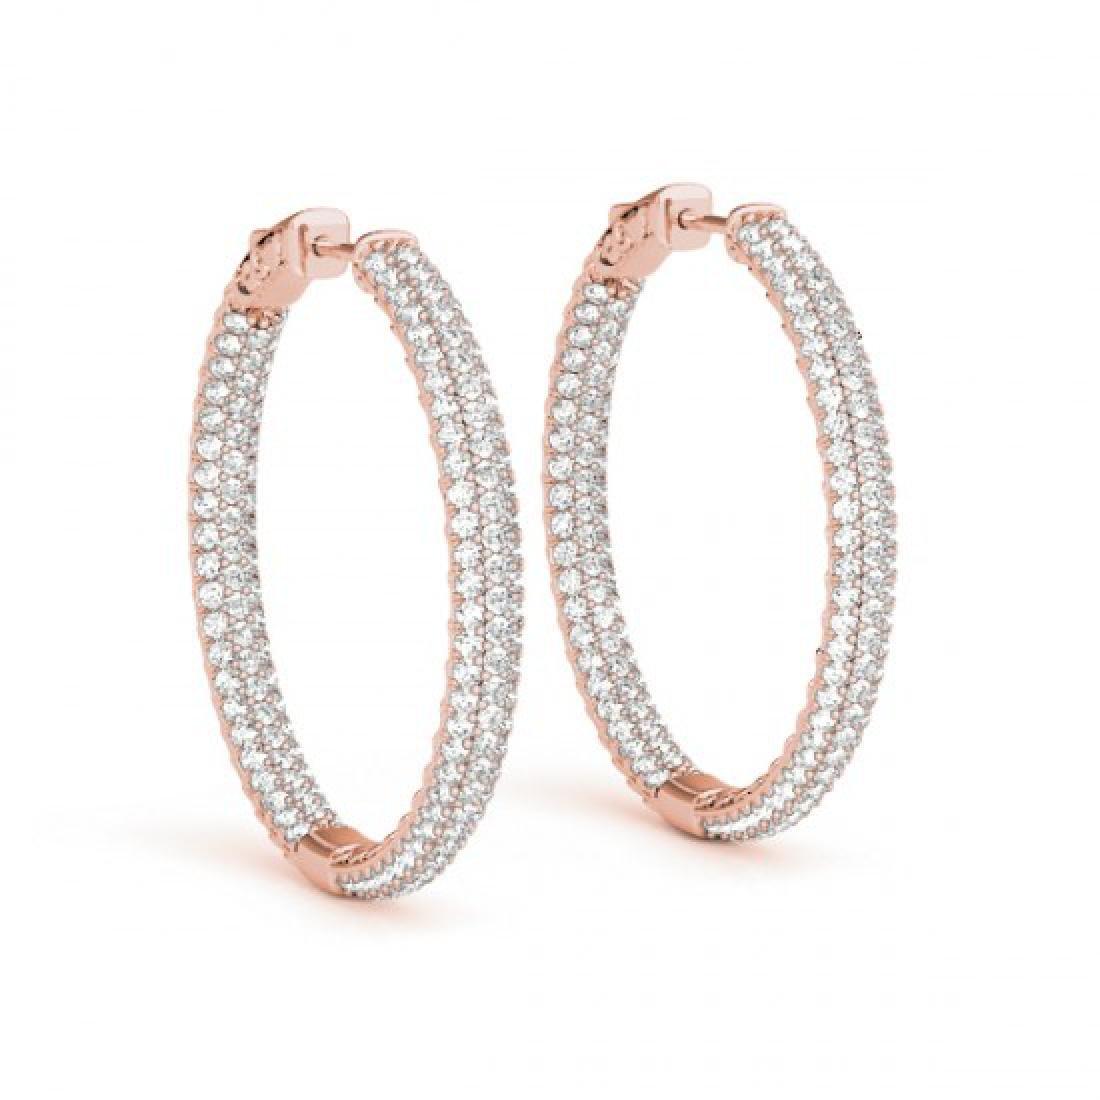 1.5 CTW Diamond VS/SI Certified 16 Mm Hoop Earrings 14K - 2